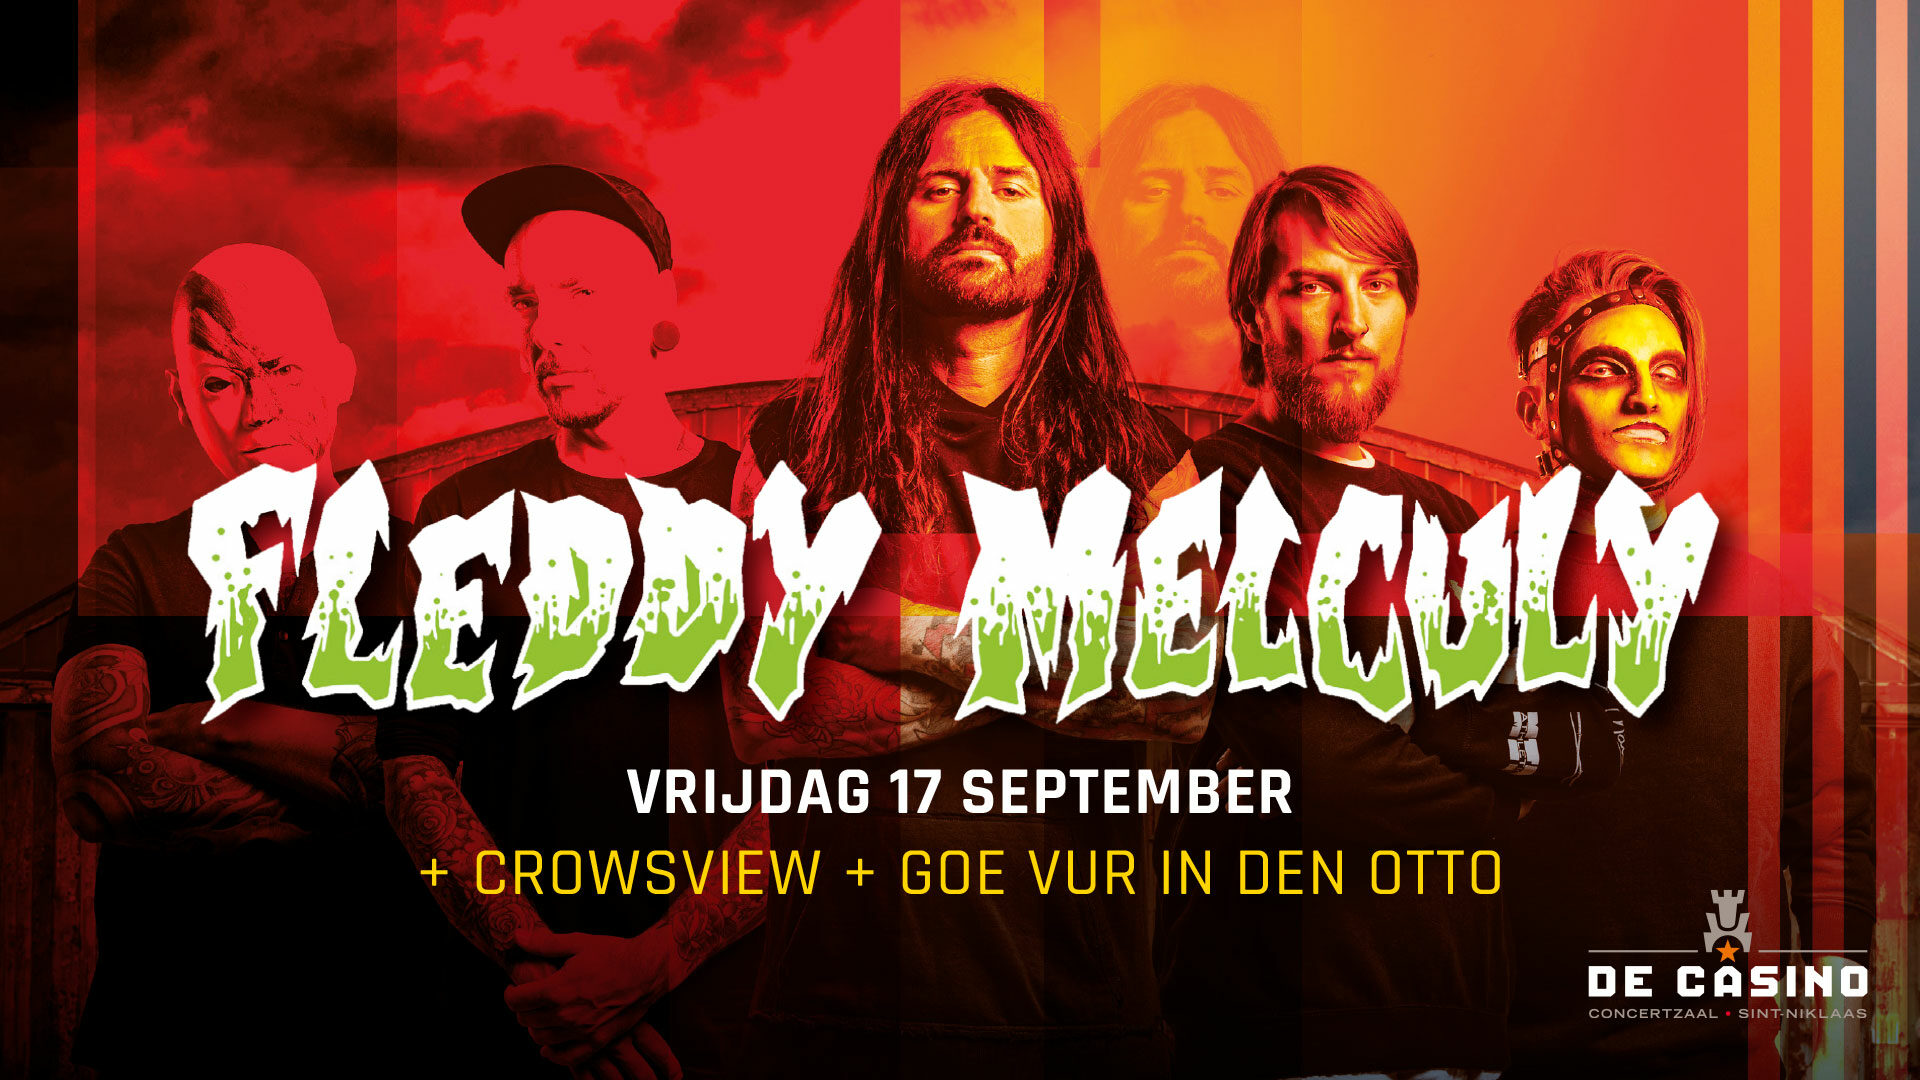 Fleddy Melculy + Crowsview / @ De Casino, Sint-Niklaas / 17-09-2021